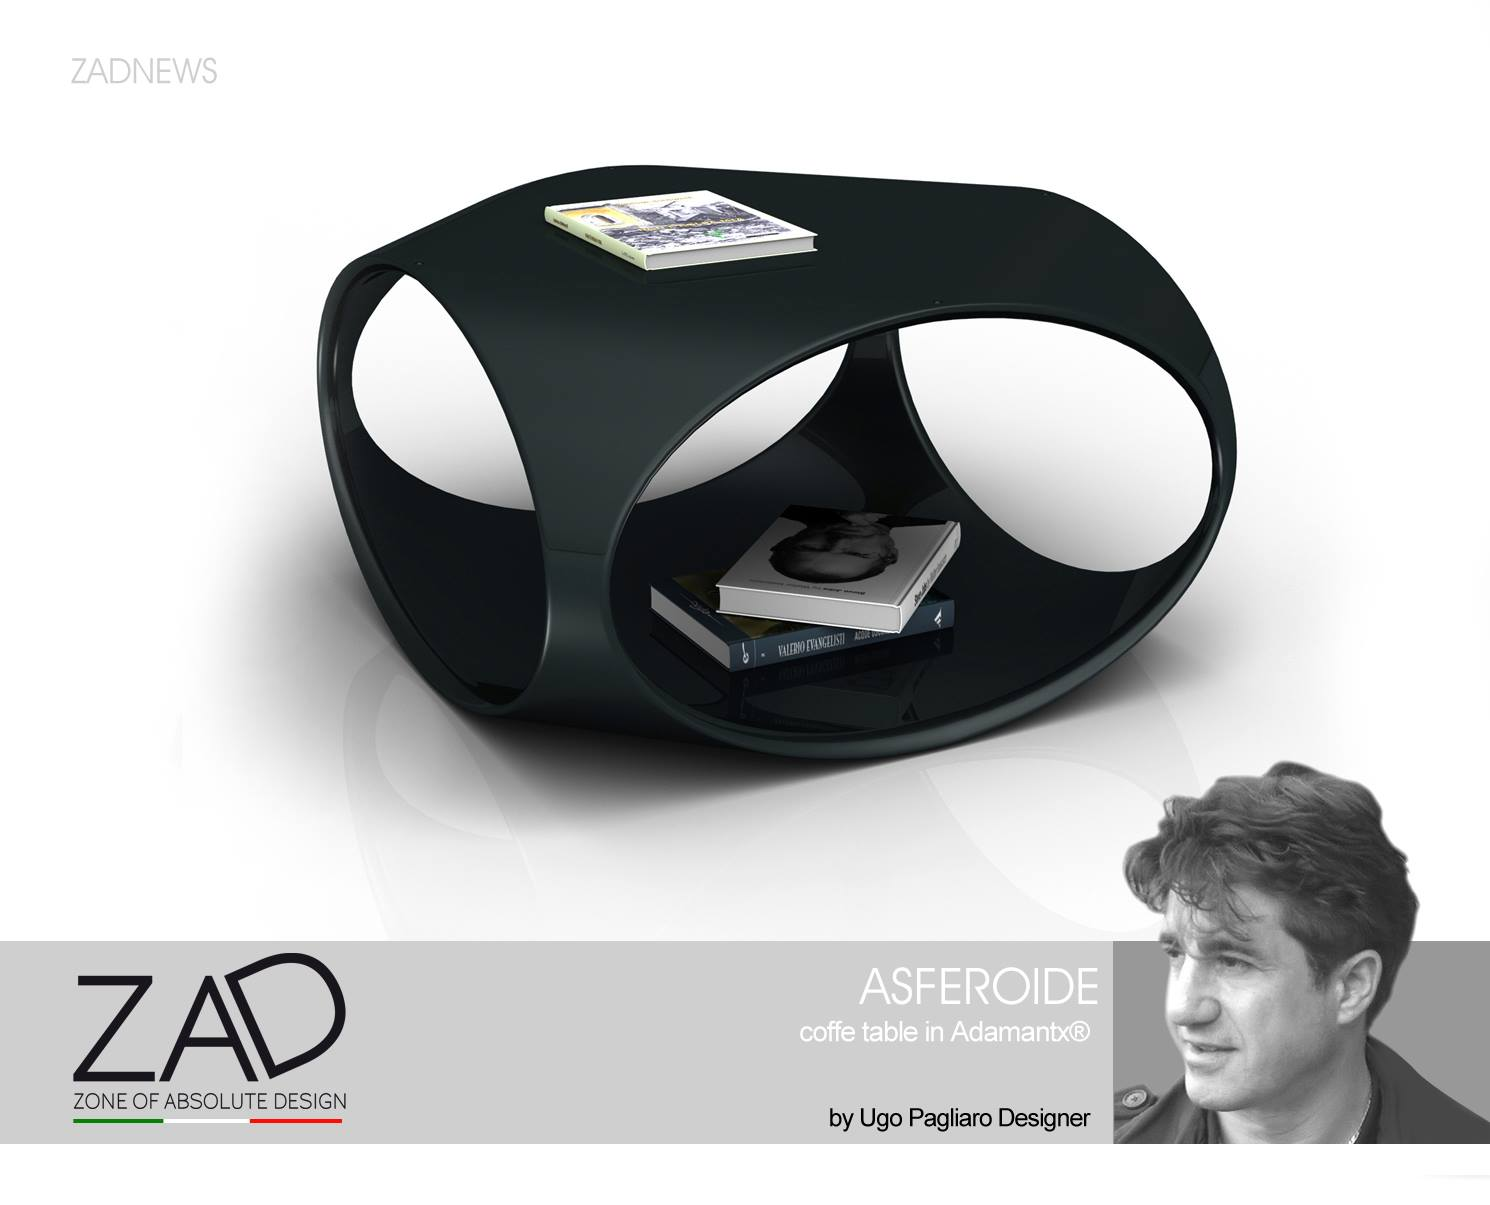 Tavolino Asferoide